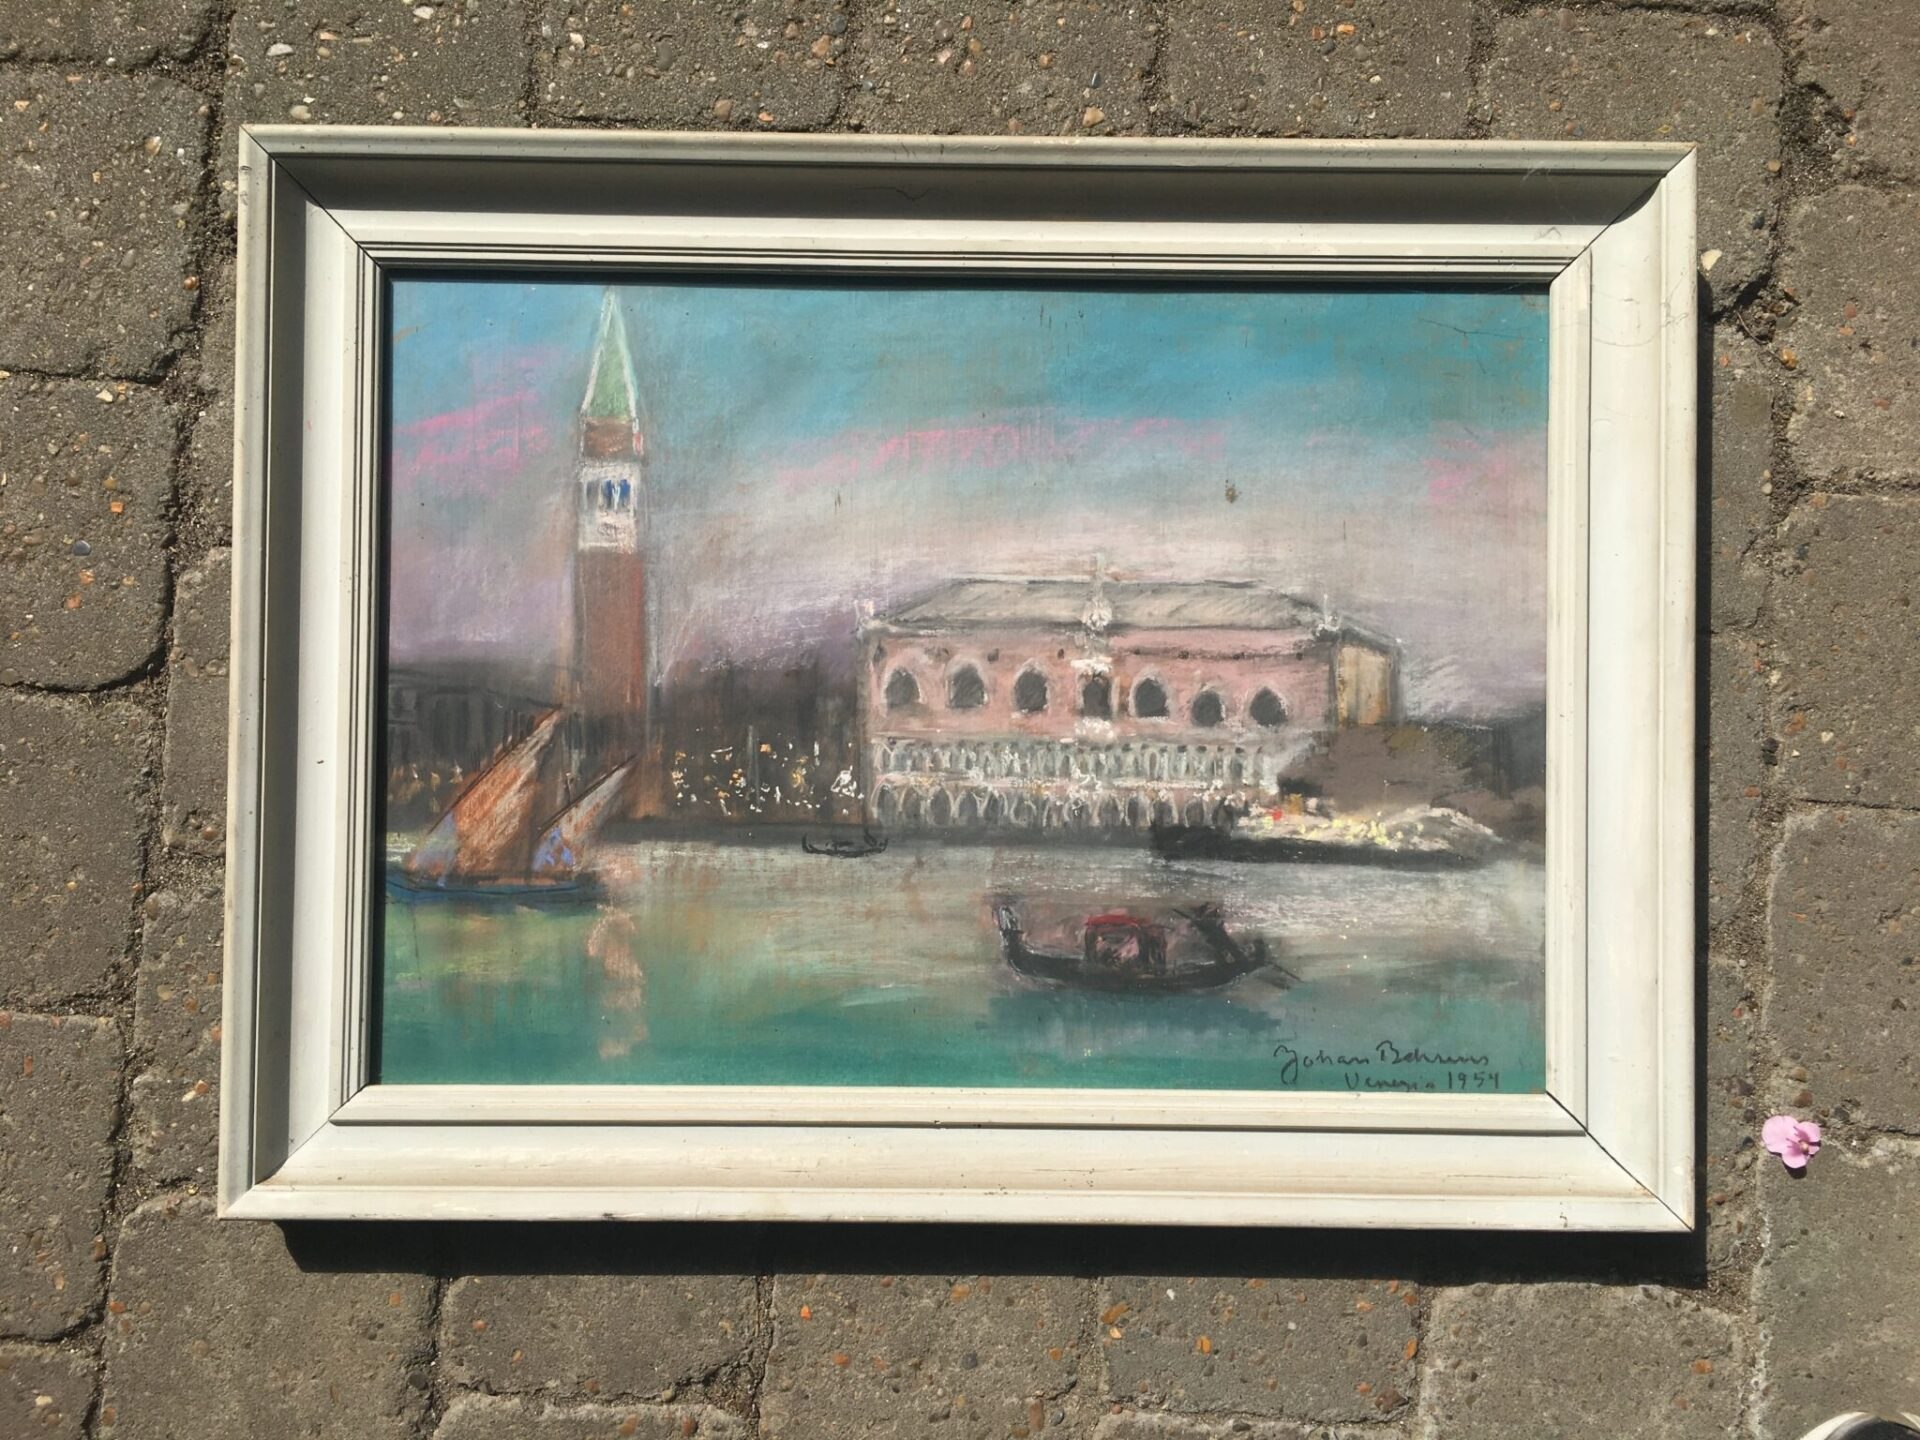 Johan Behrens, Venedig 1954, pastel/kridt,(45 x 60 cm). pris 500 kr